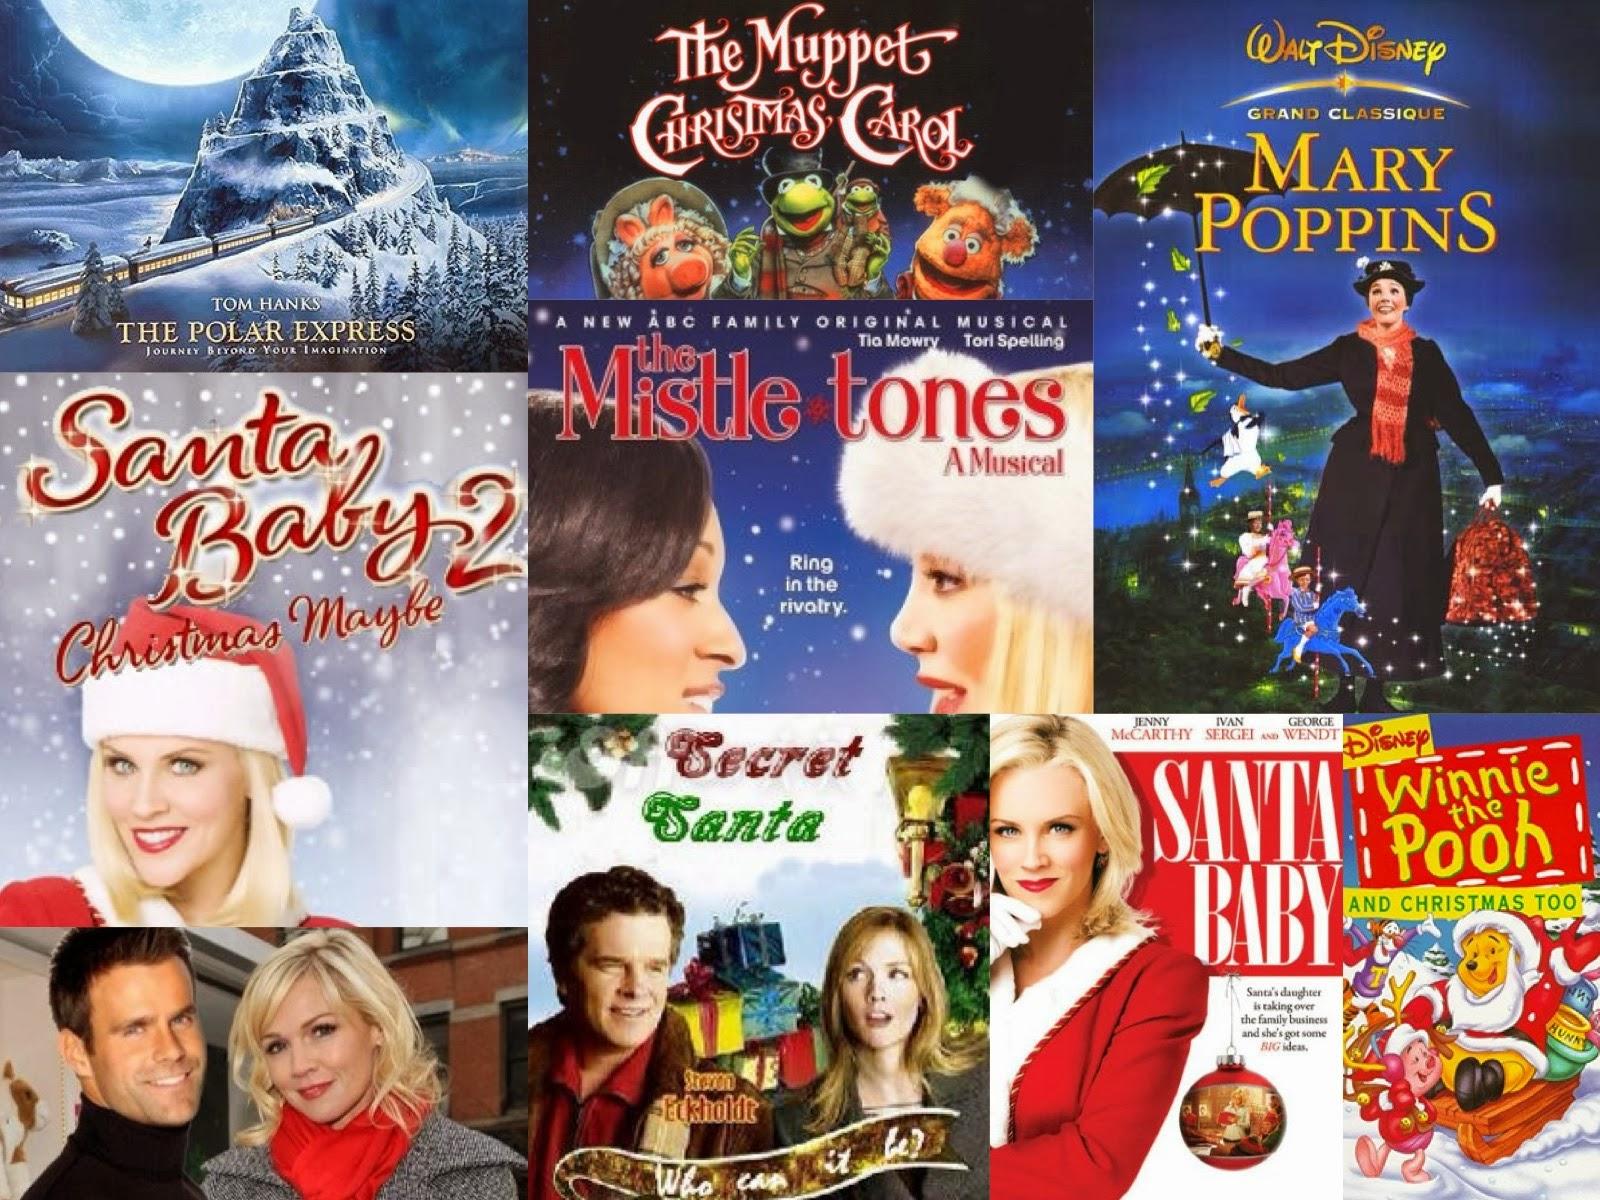 abc familys 25 days of christmas - Christmas Movies Abc Family